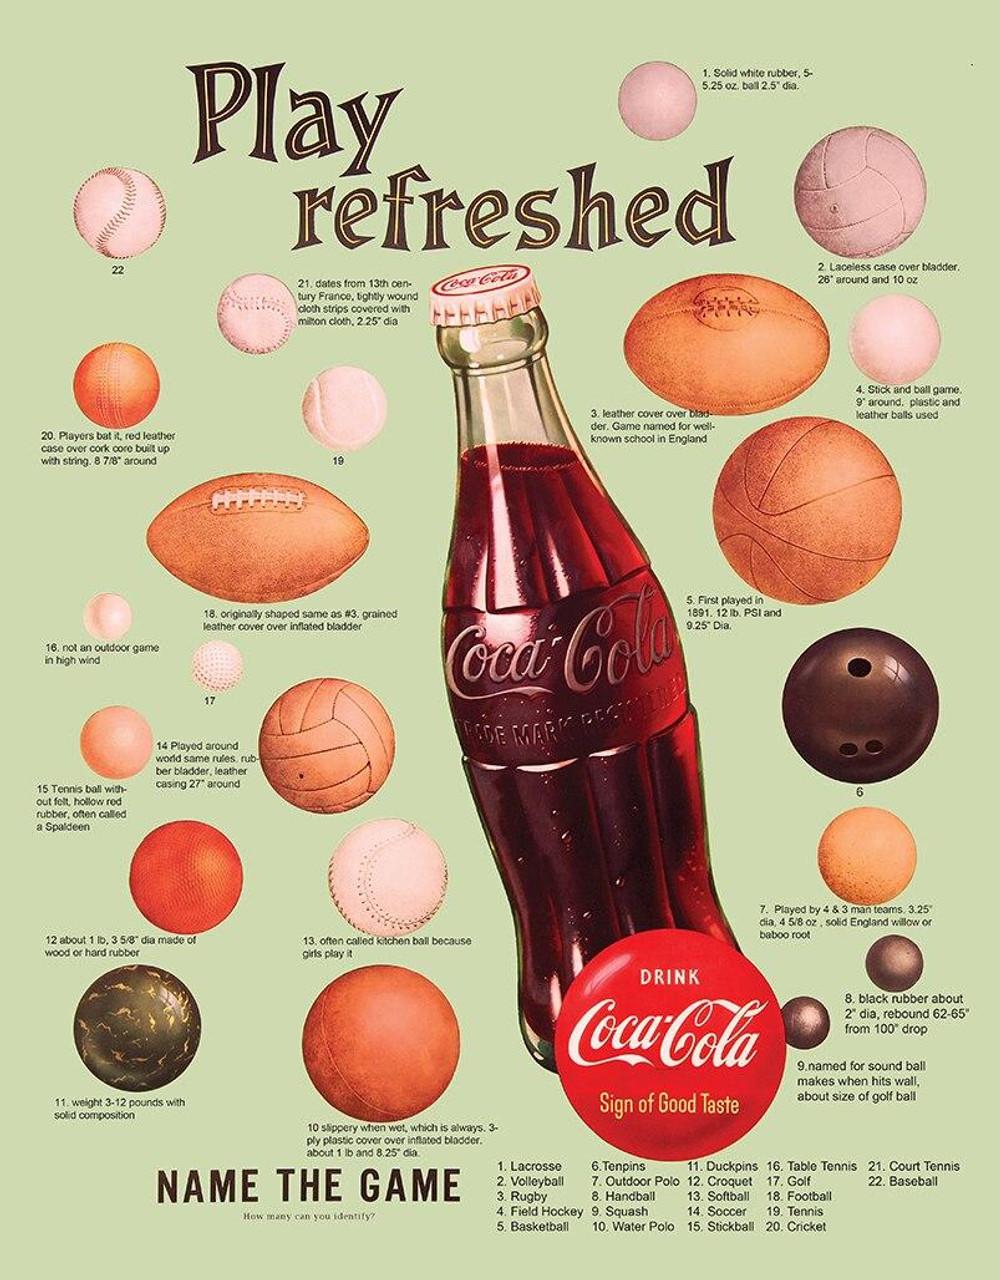 Coca-Cola Coke Play